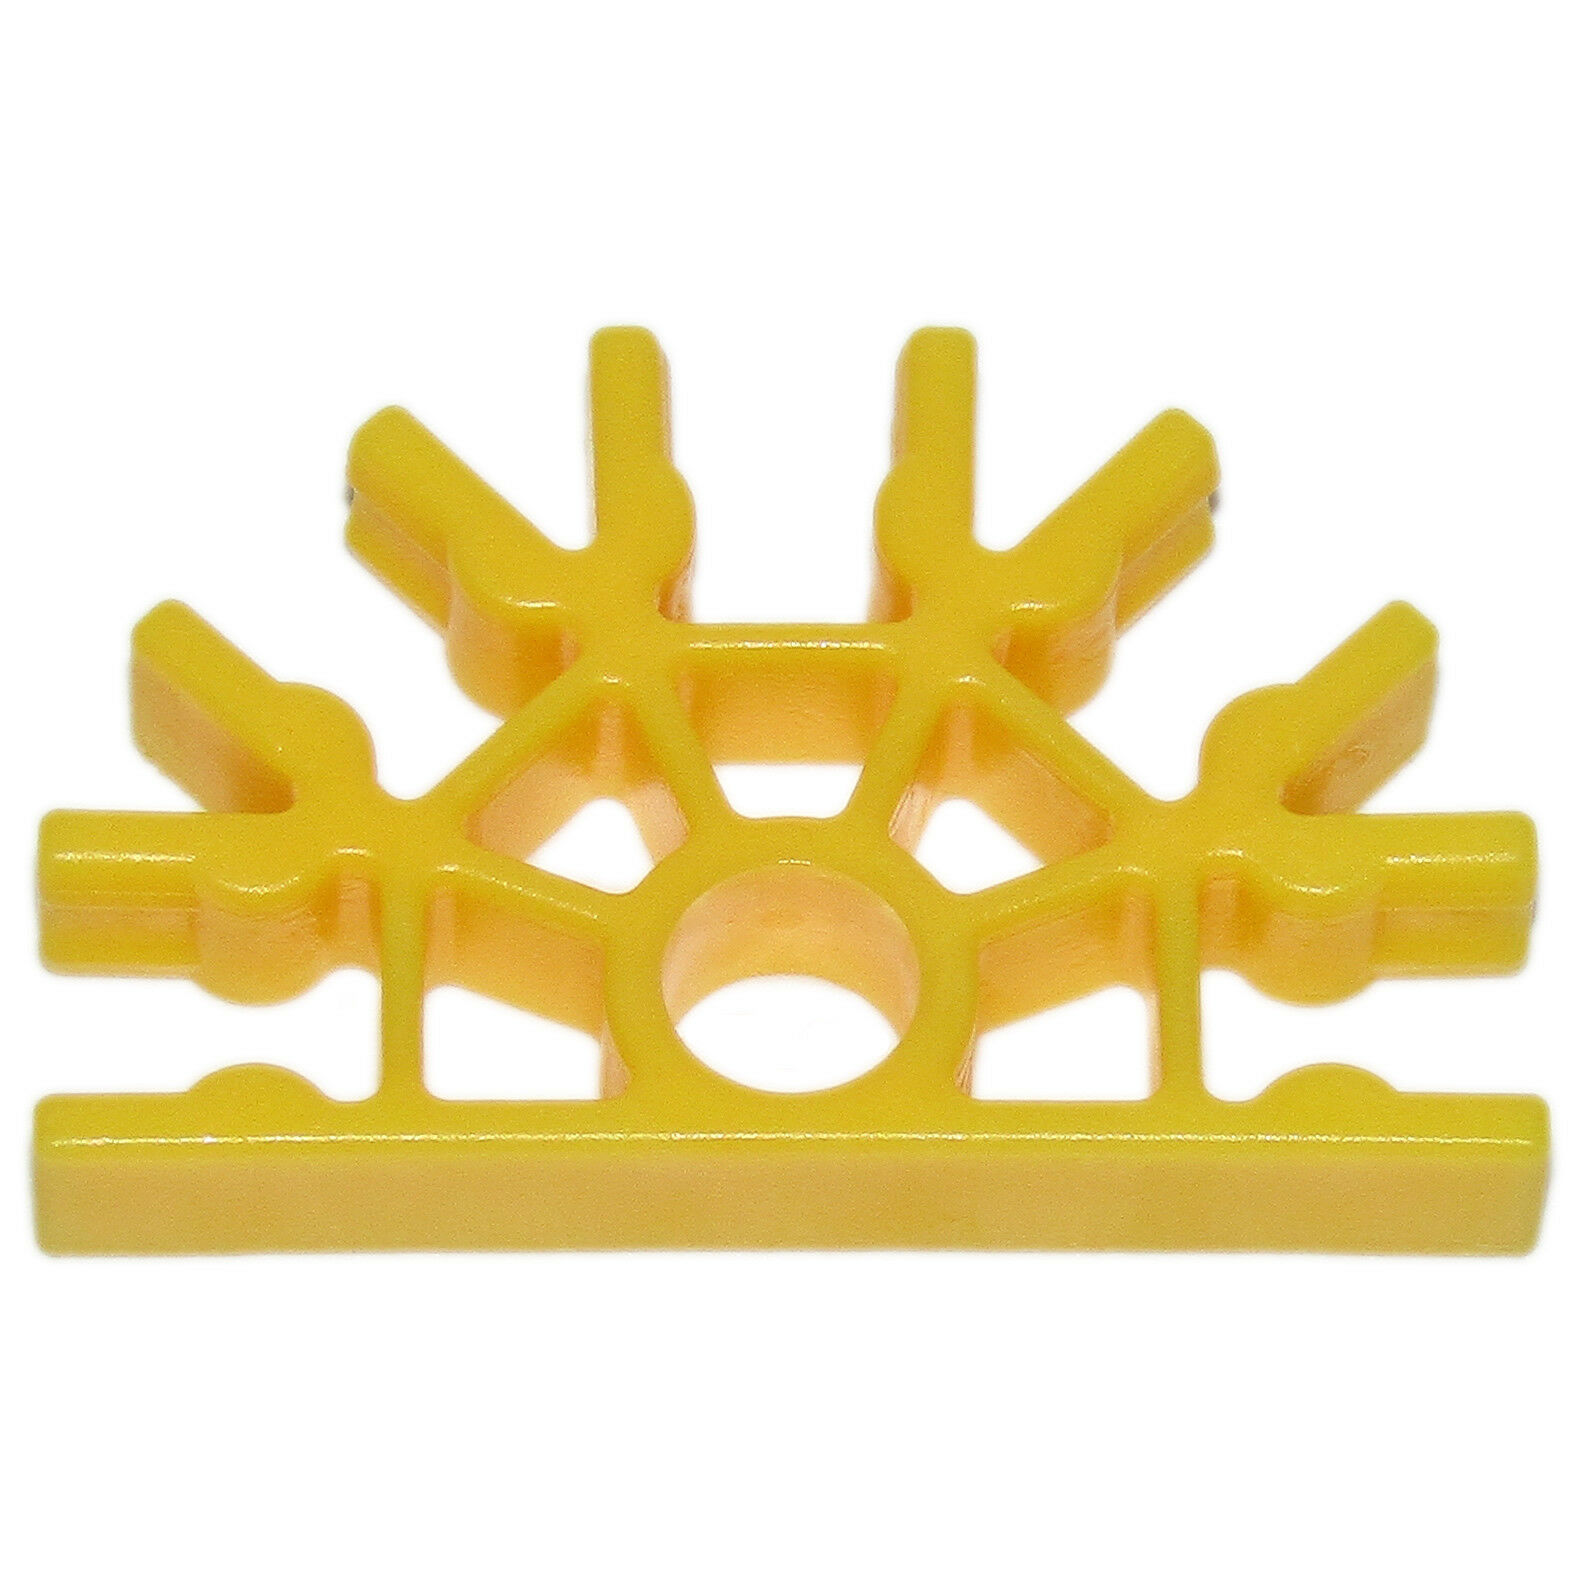 KNEX 750 Yellow Connectors (5) K'nex Standard Parts and Pieces